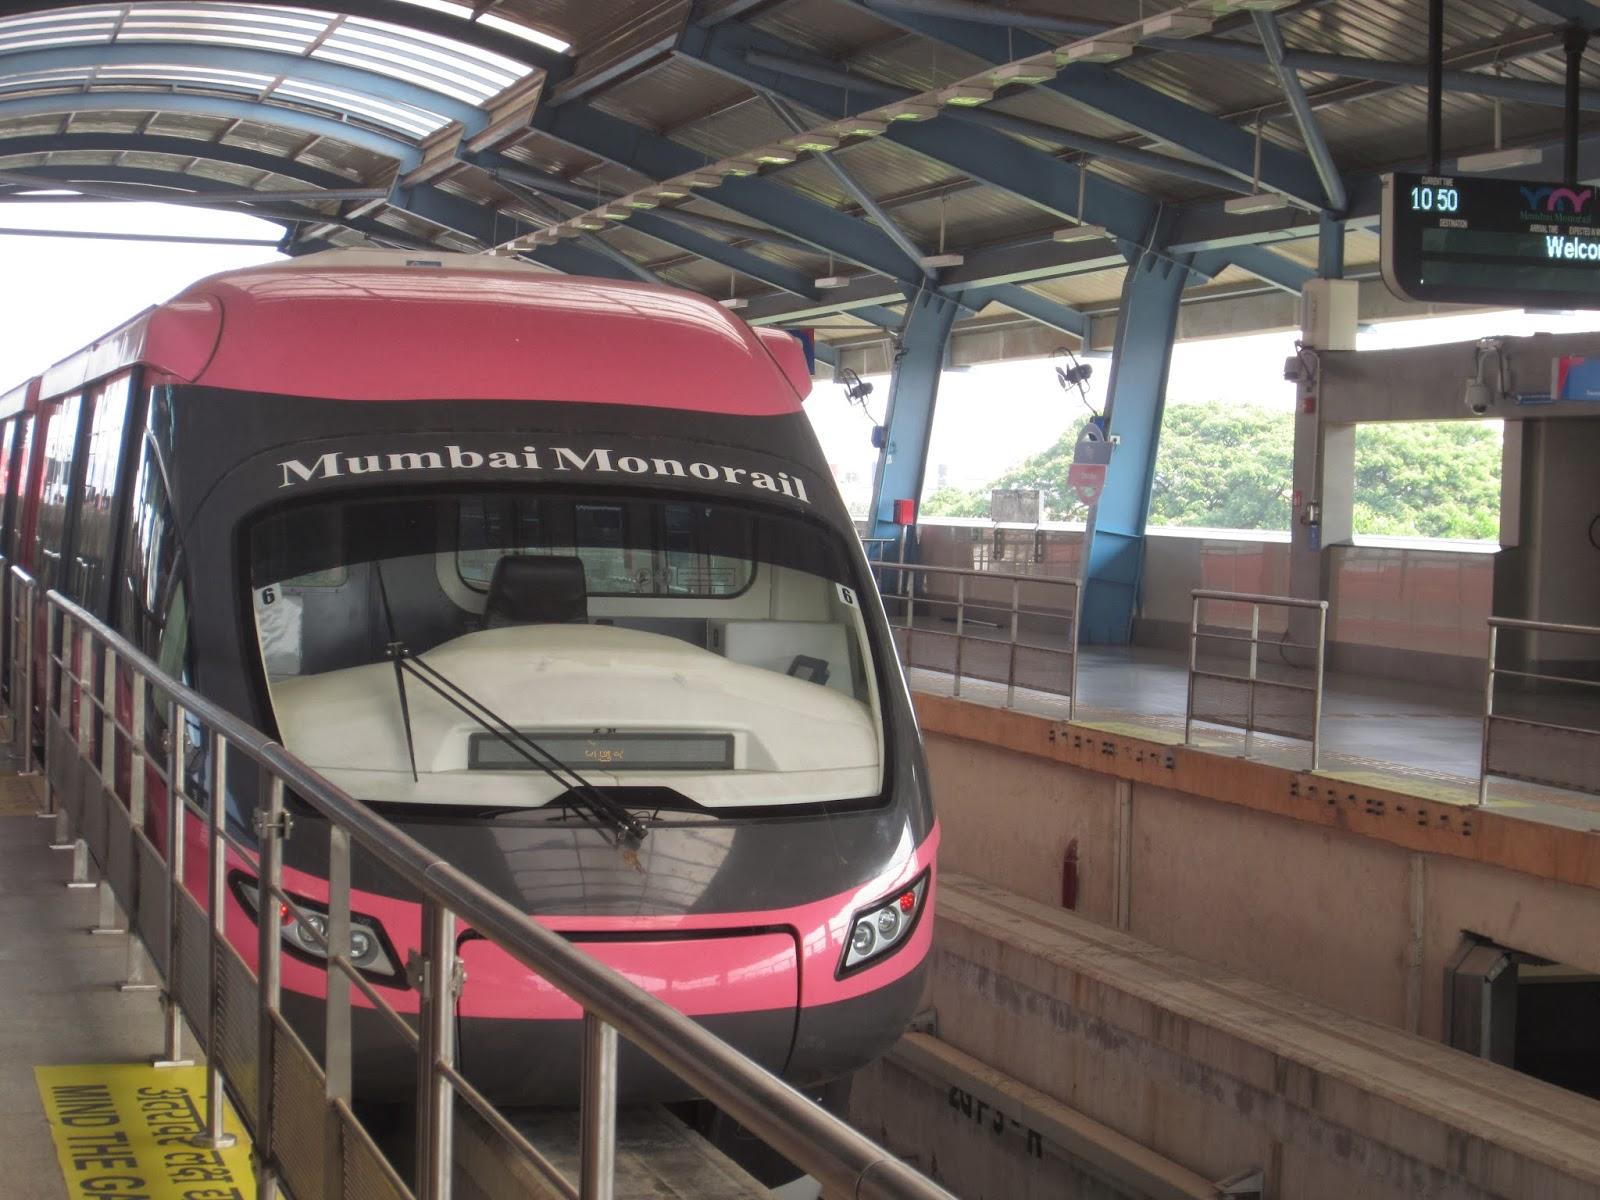 Taking Off in the Mumbai Monorail